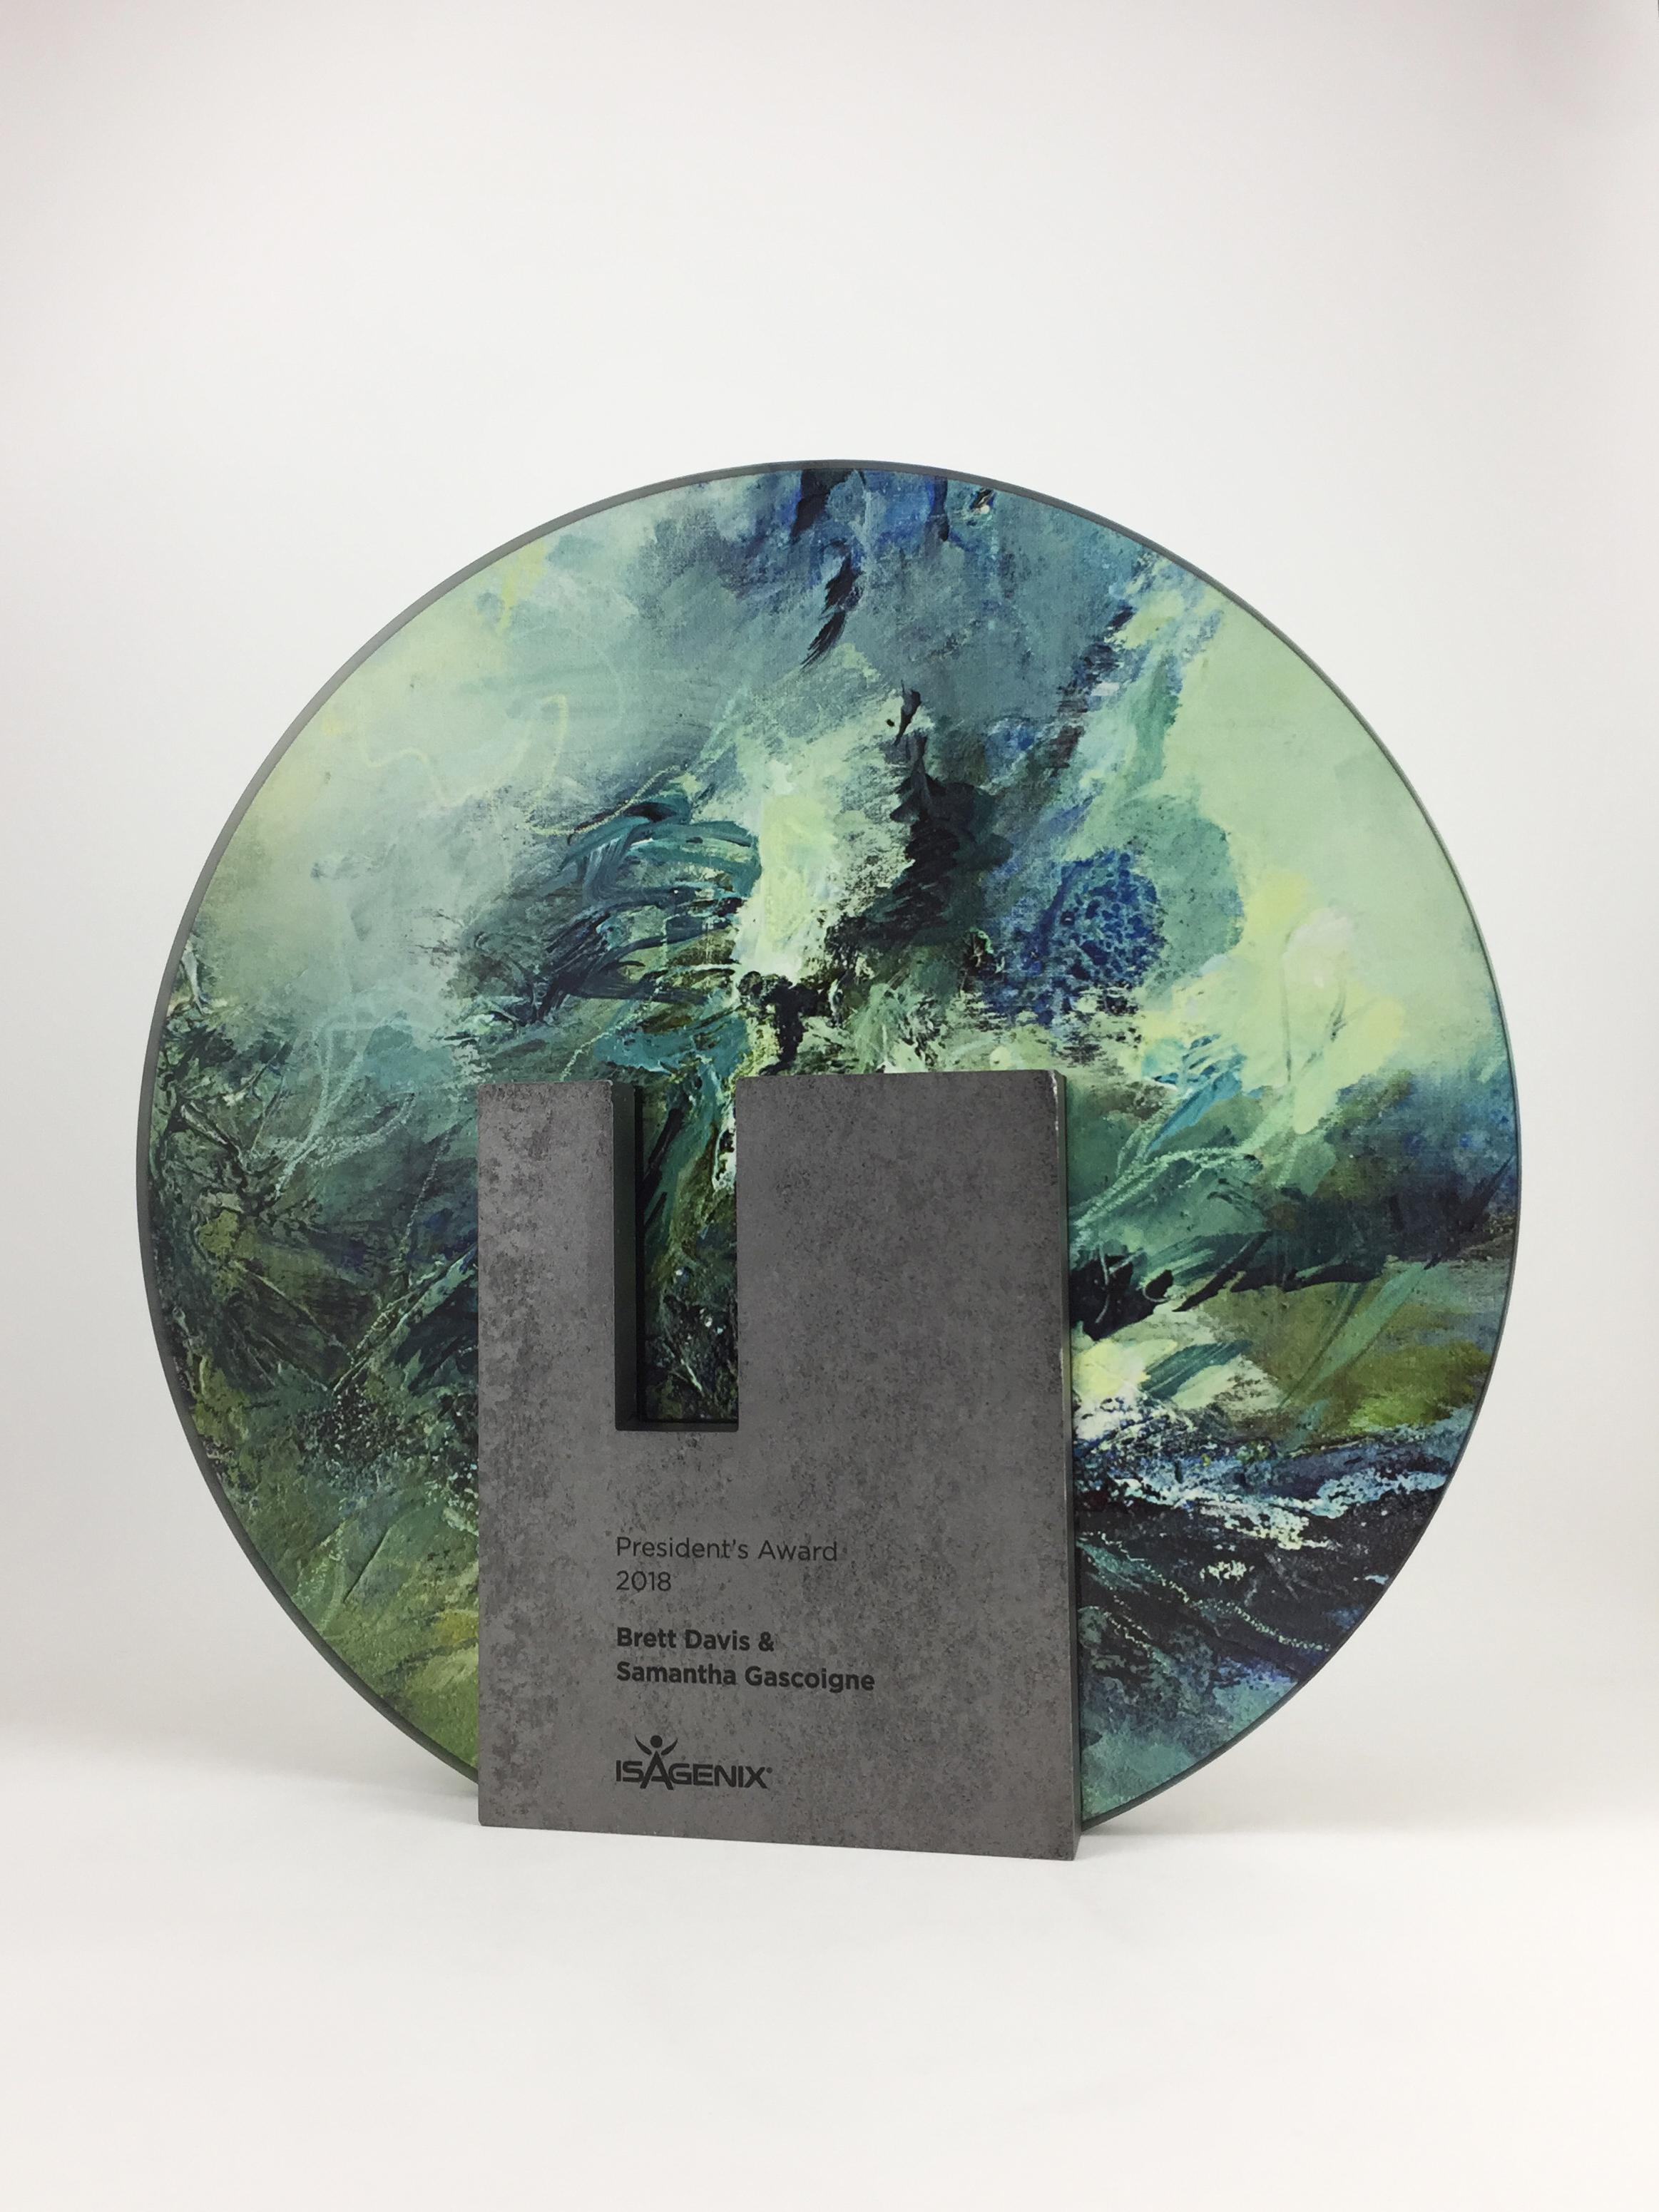 isagenix-presidents-metal-glass-art-trophy-awards-sculpture-01.jpg